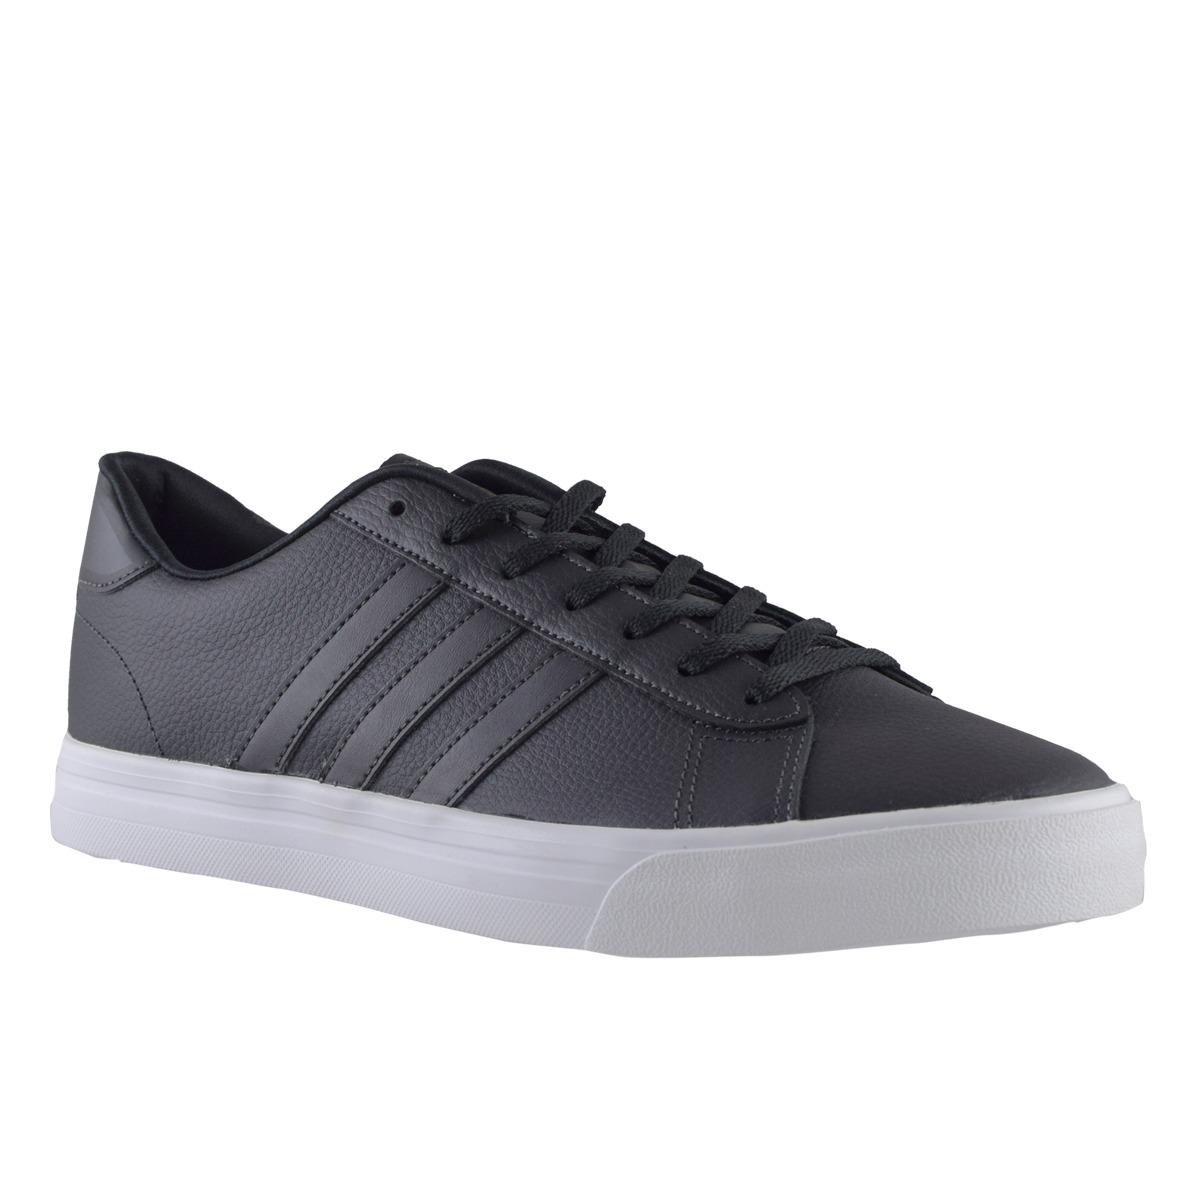 purchase cheap eed53 5d0bc zapatillas adidas neo super daily hombre. Cargando zoom.